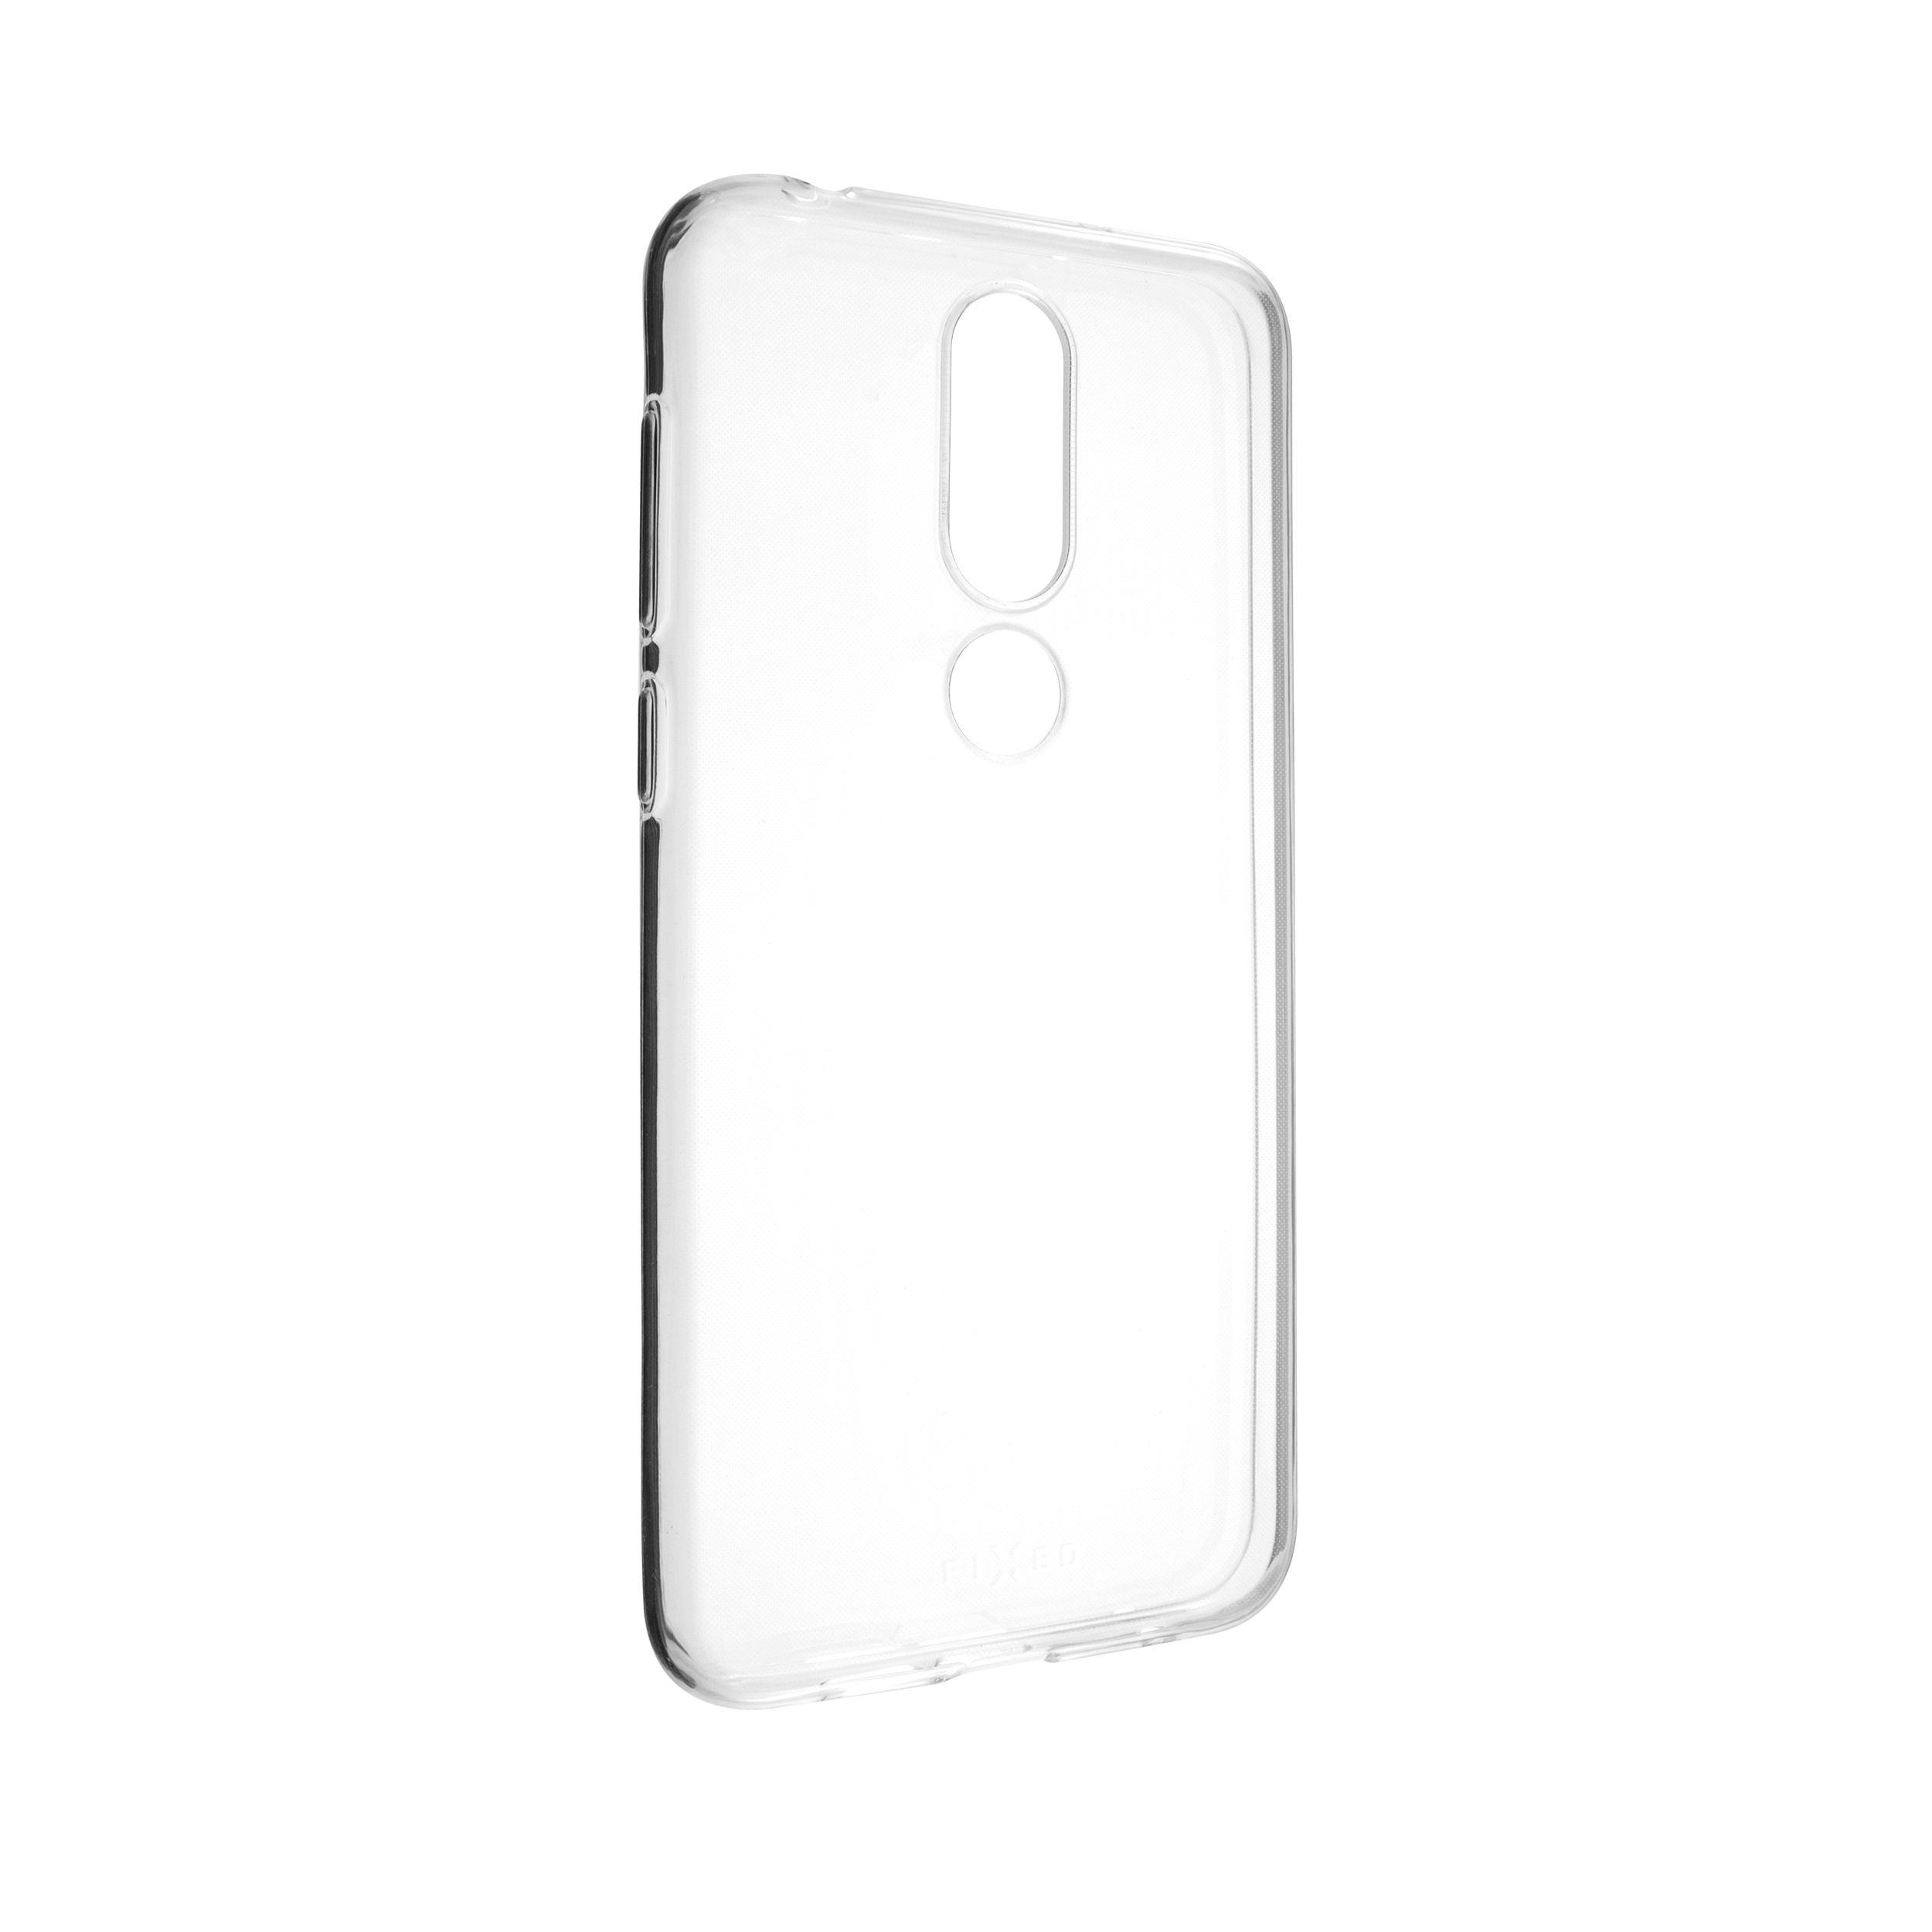 Ultratenké TPU gelové pouzdro FIXED Skin pro Nokia 6.1 Plus, 0,6 mm, čiré